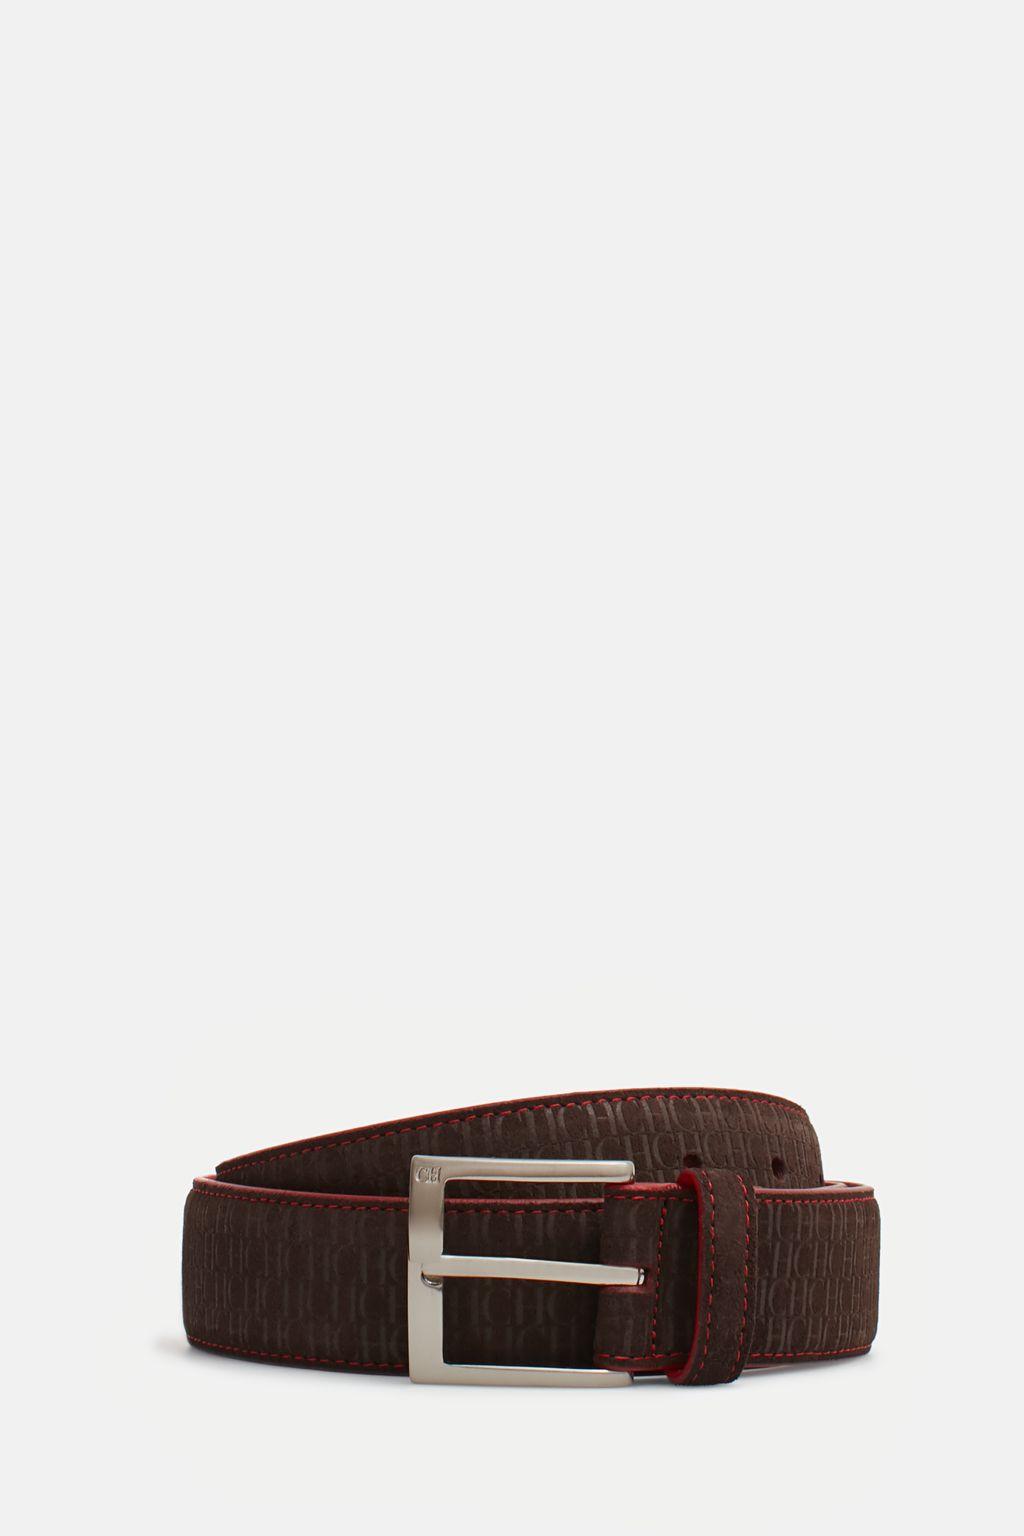 Suede belt with CH pattern